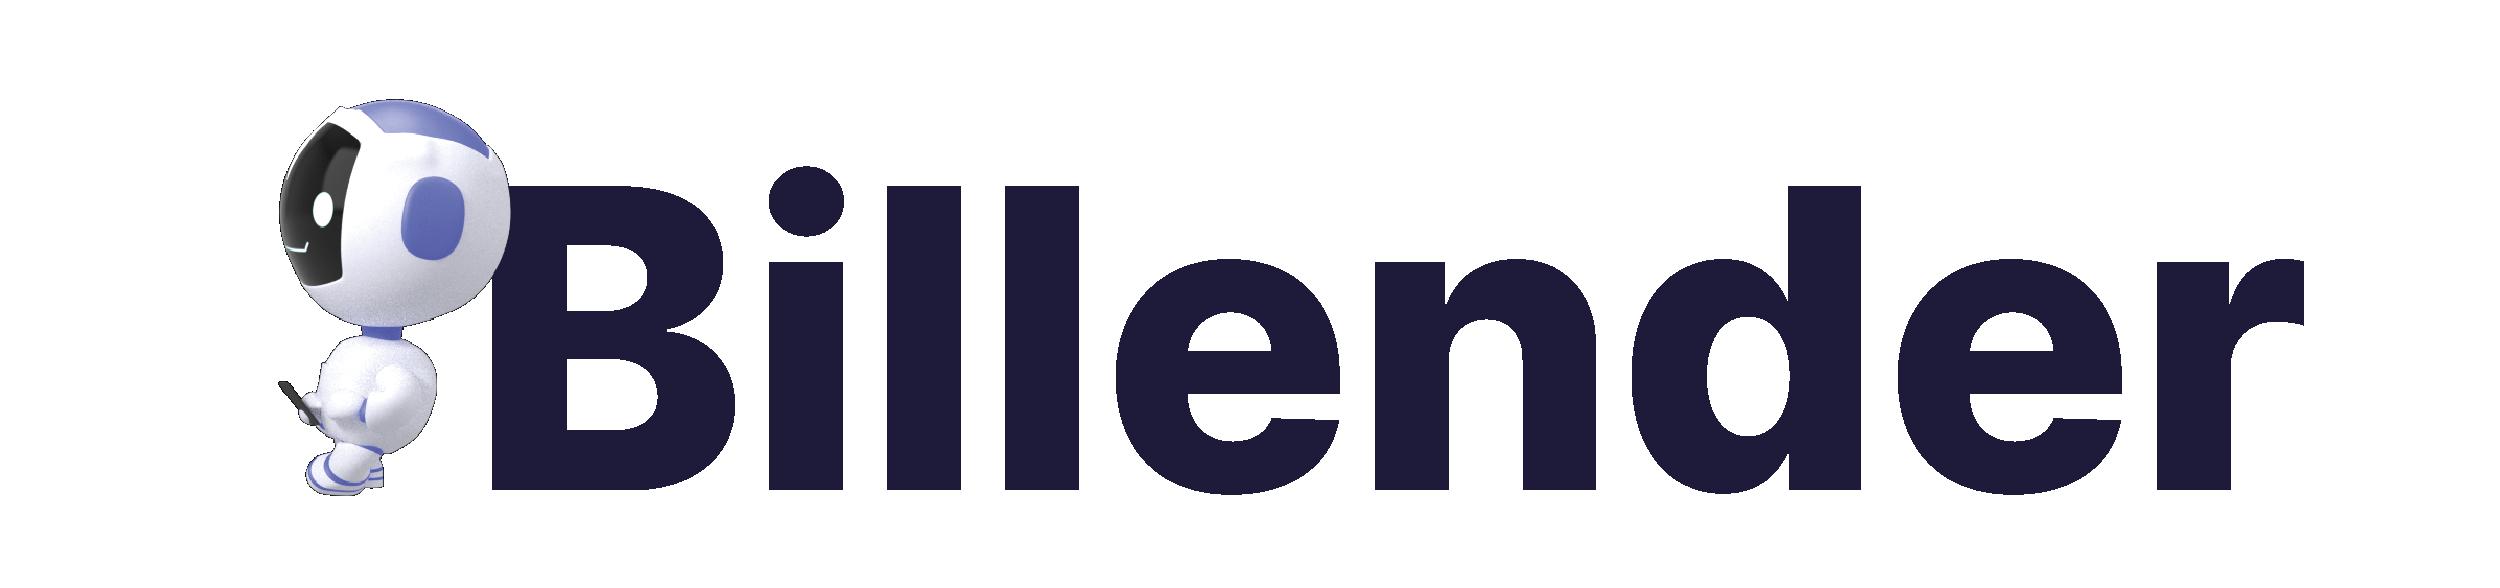 Fiuge logo